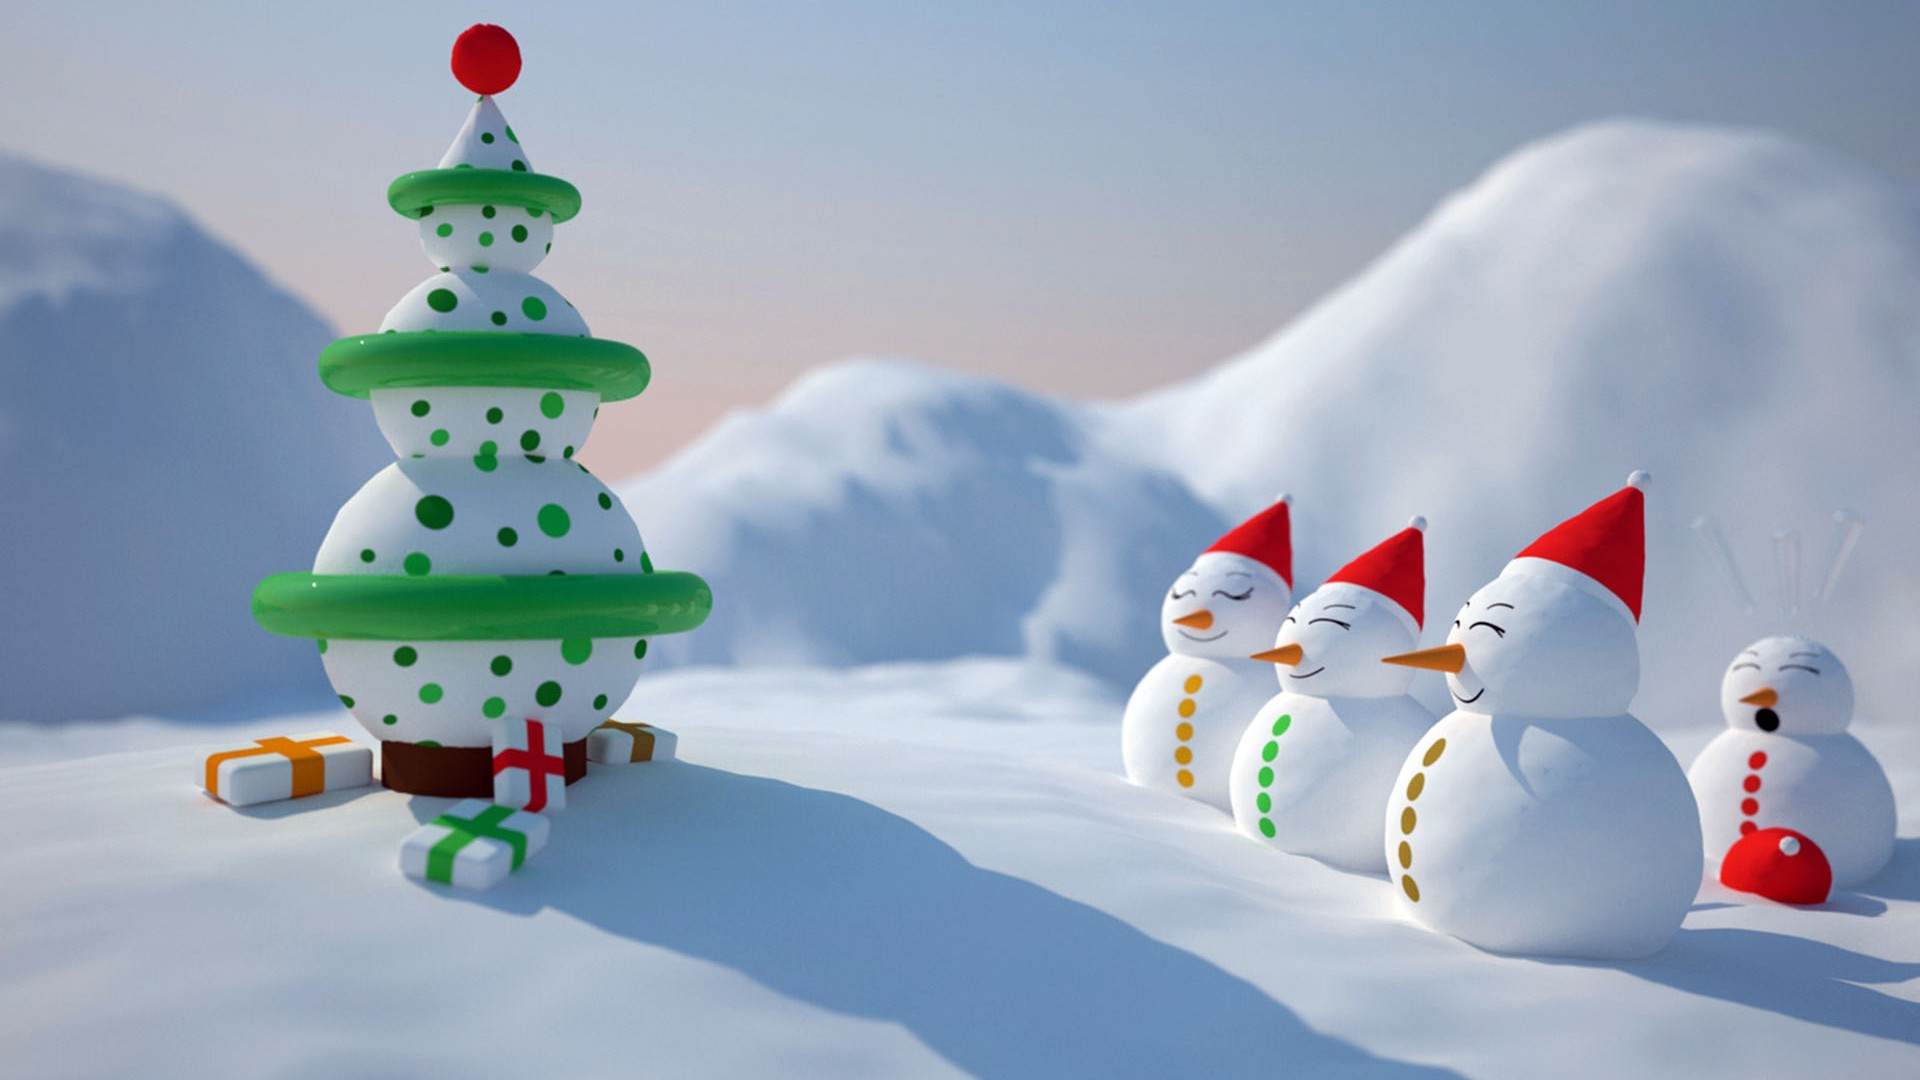 Snowman Christmas Wallpaper Hd Wallpapers